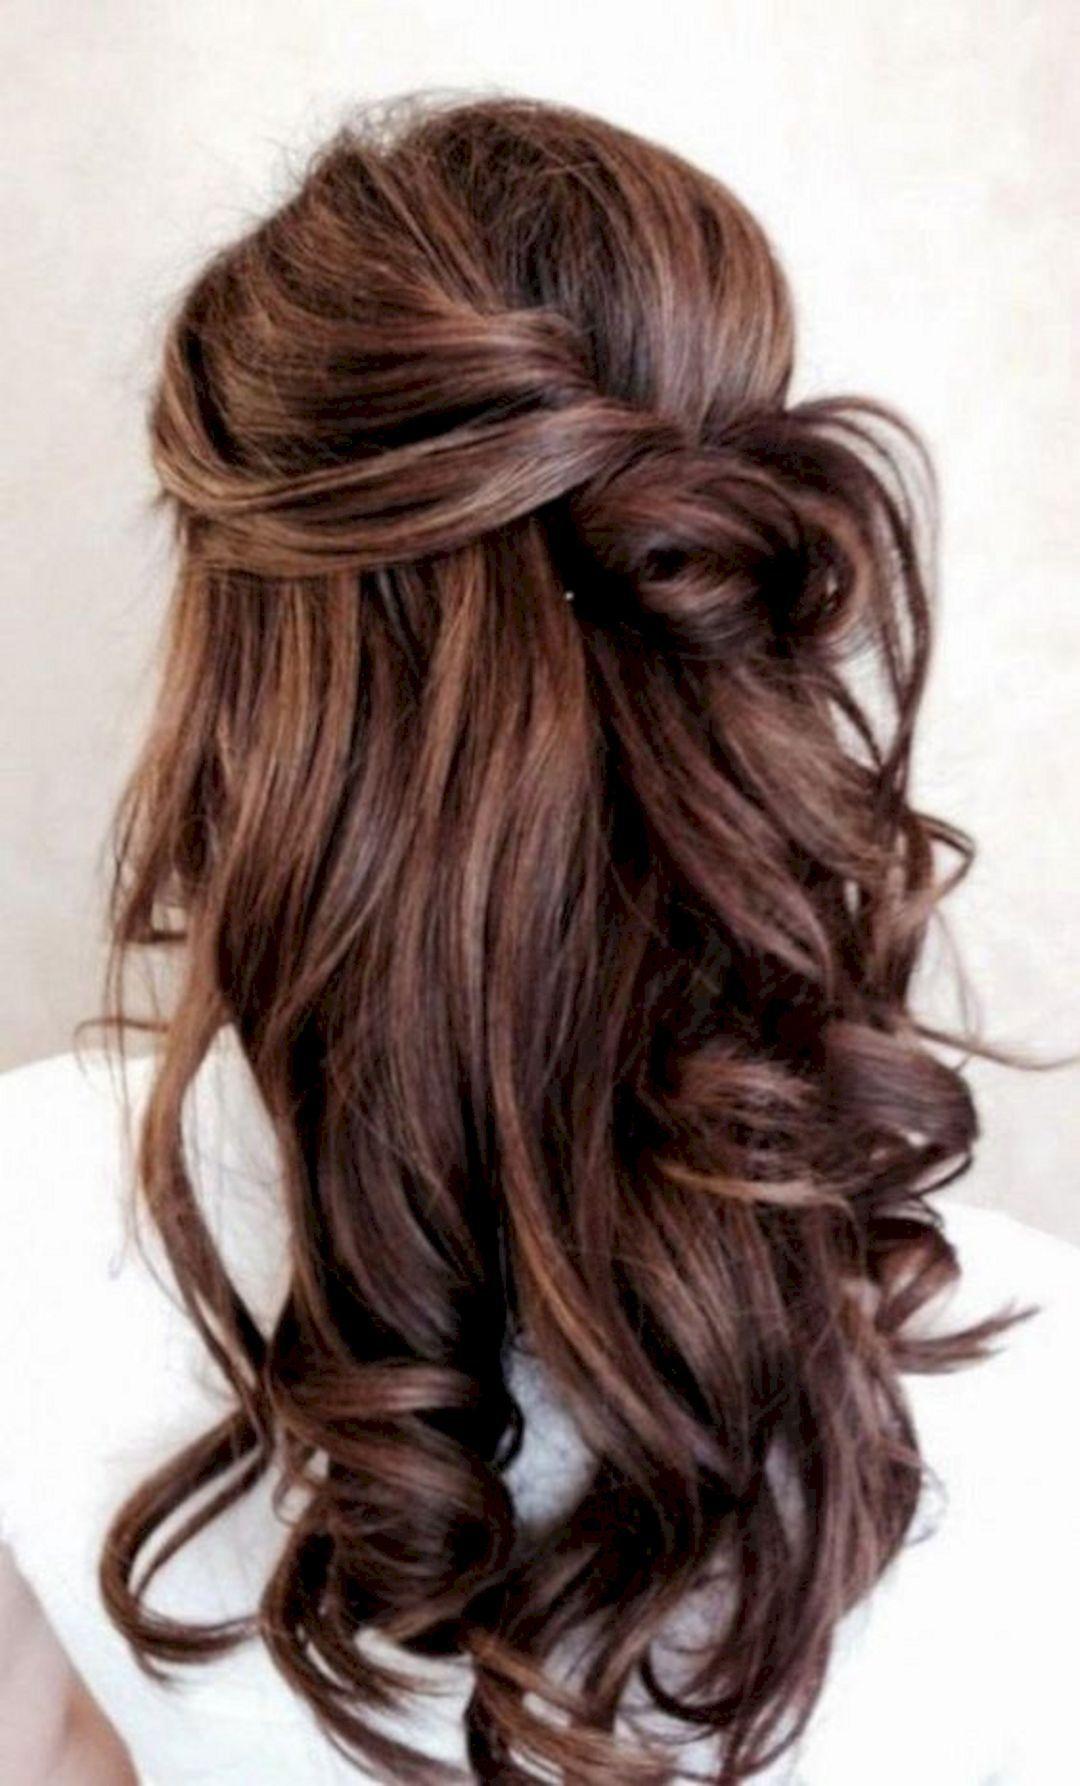 Stunning Half Up Half Down Wedding Hairstyles Ideas No 76 Hair Styles